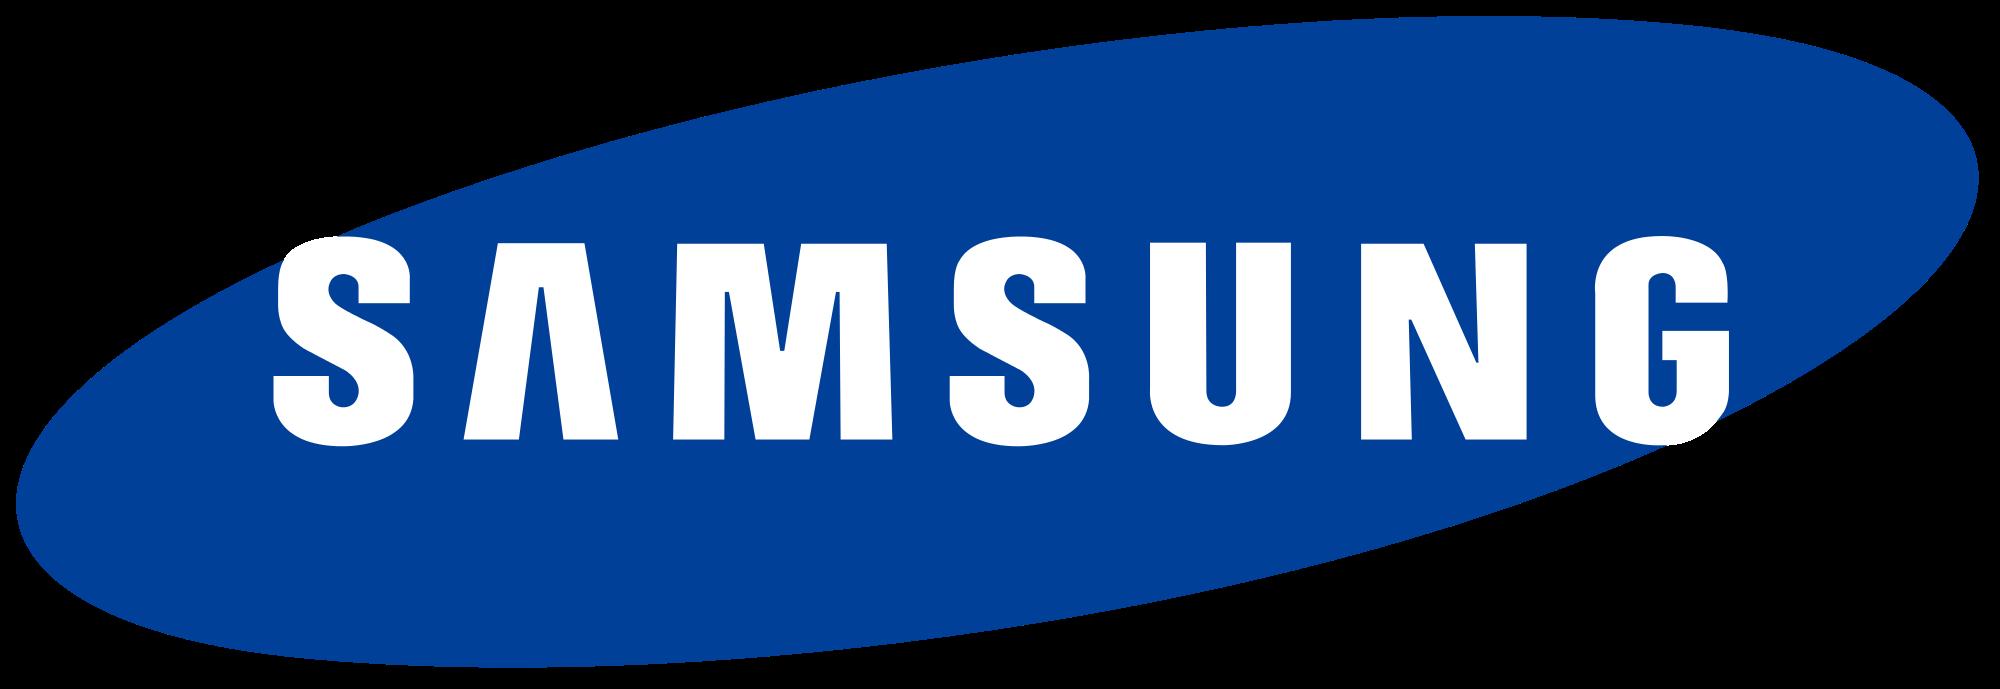 samsung_logo.png